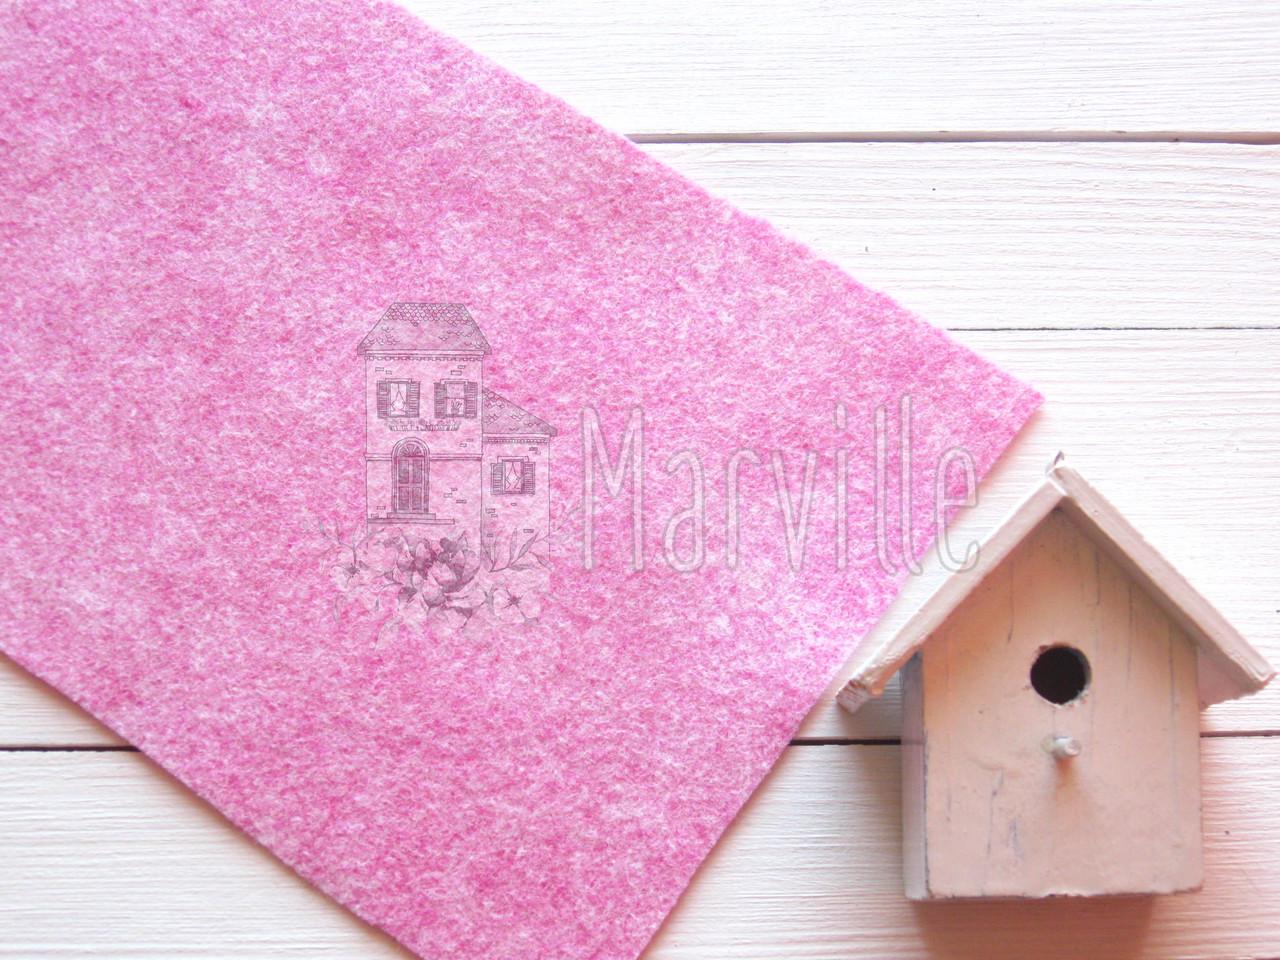 Фетр американский мягкий  Розовый пикси (2337 Pixie Pink)